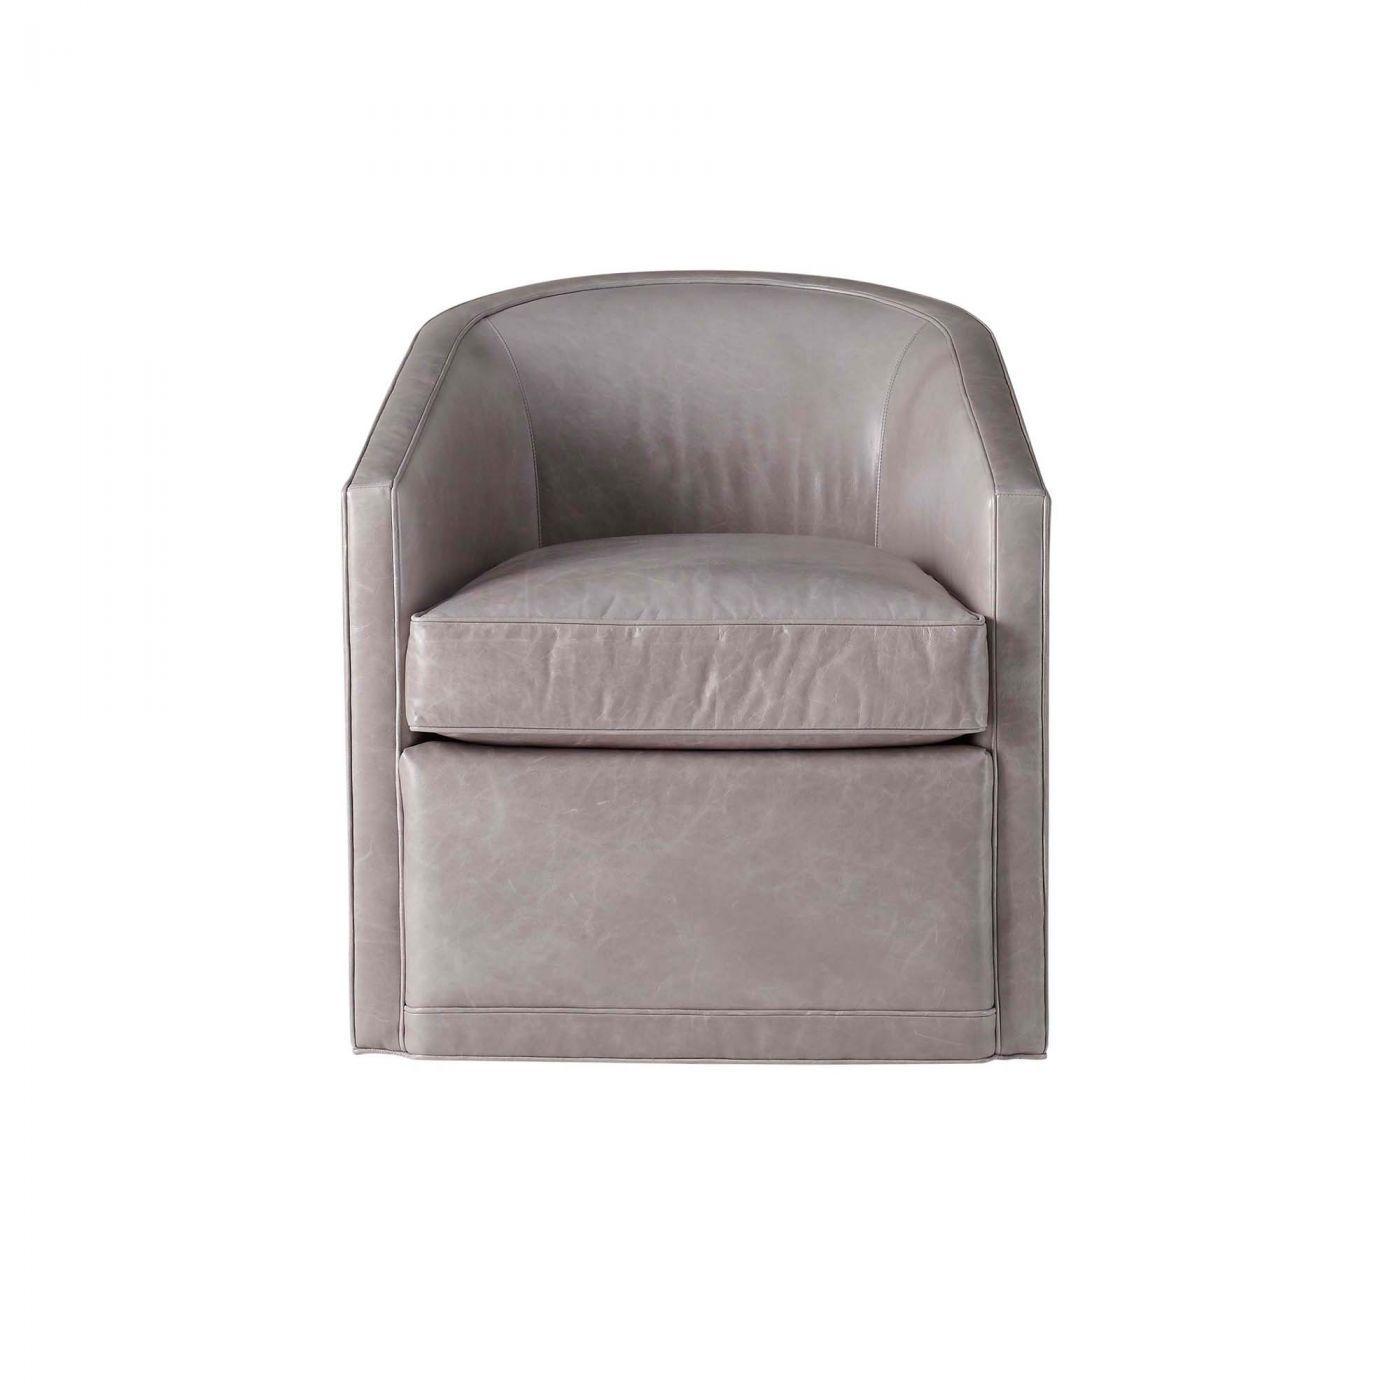 Serge bucket chair L WS105 CH in Kravet s 100% Leather L Haute